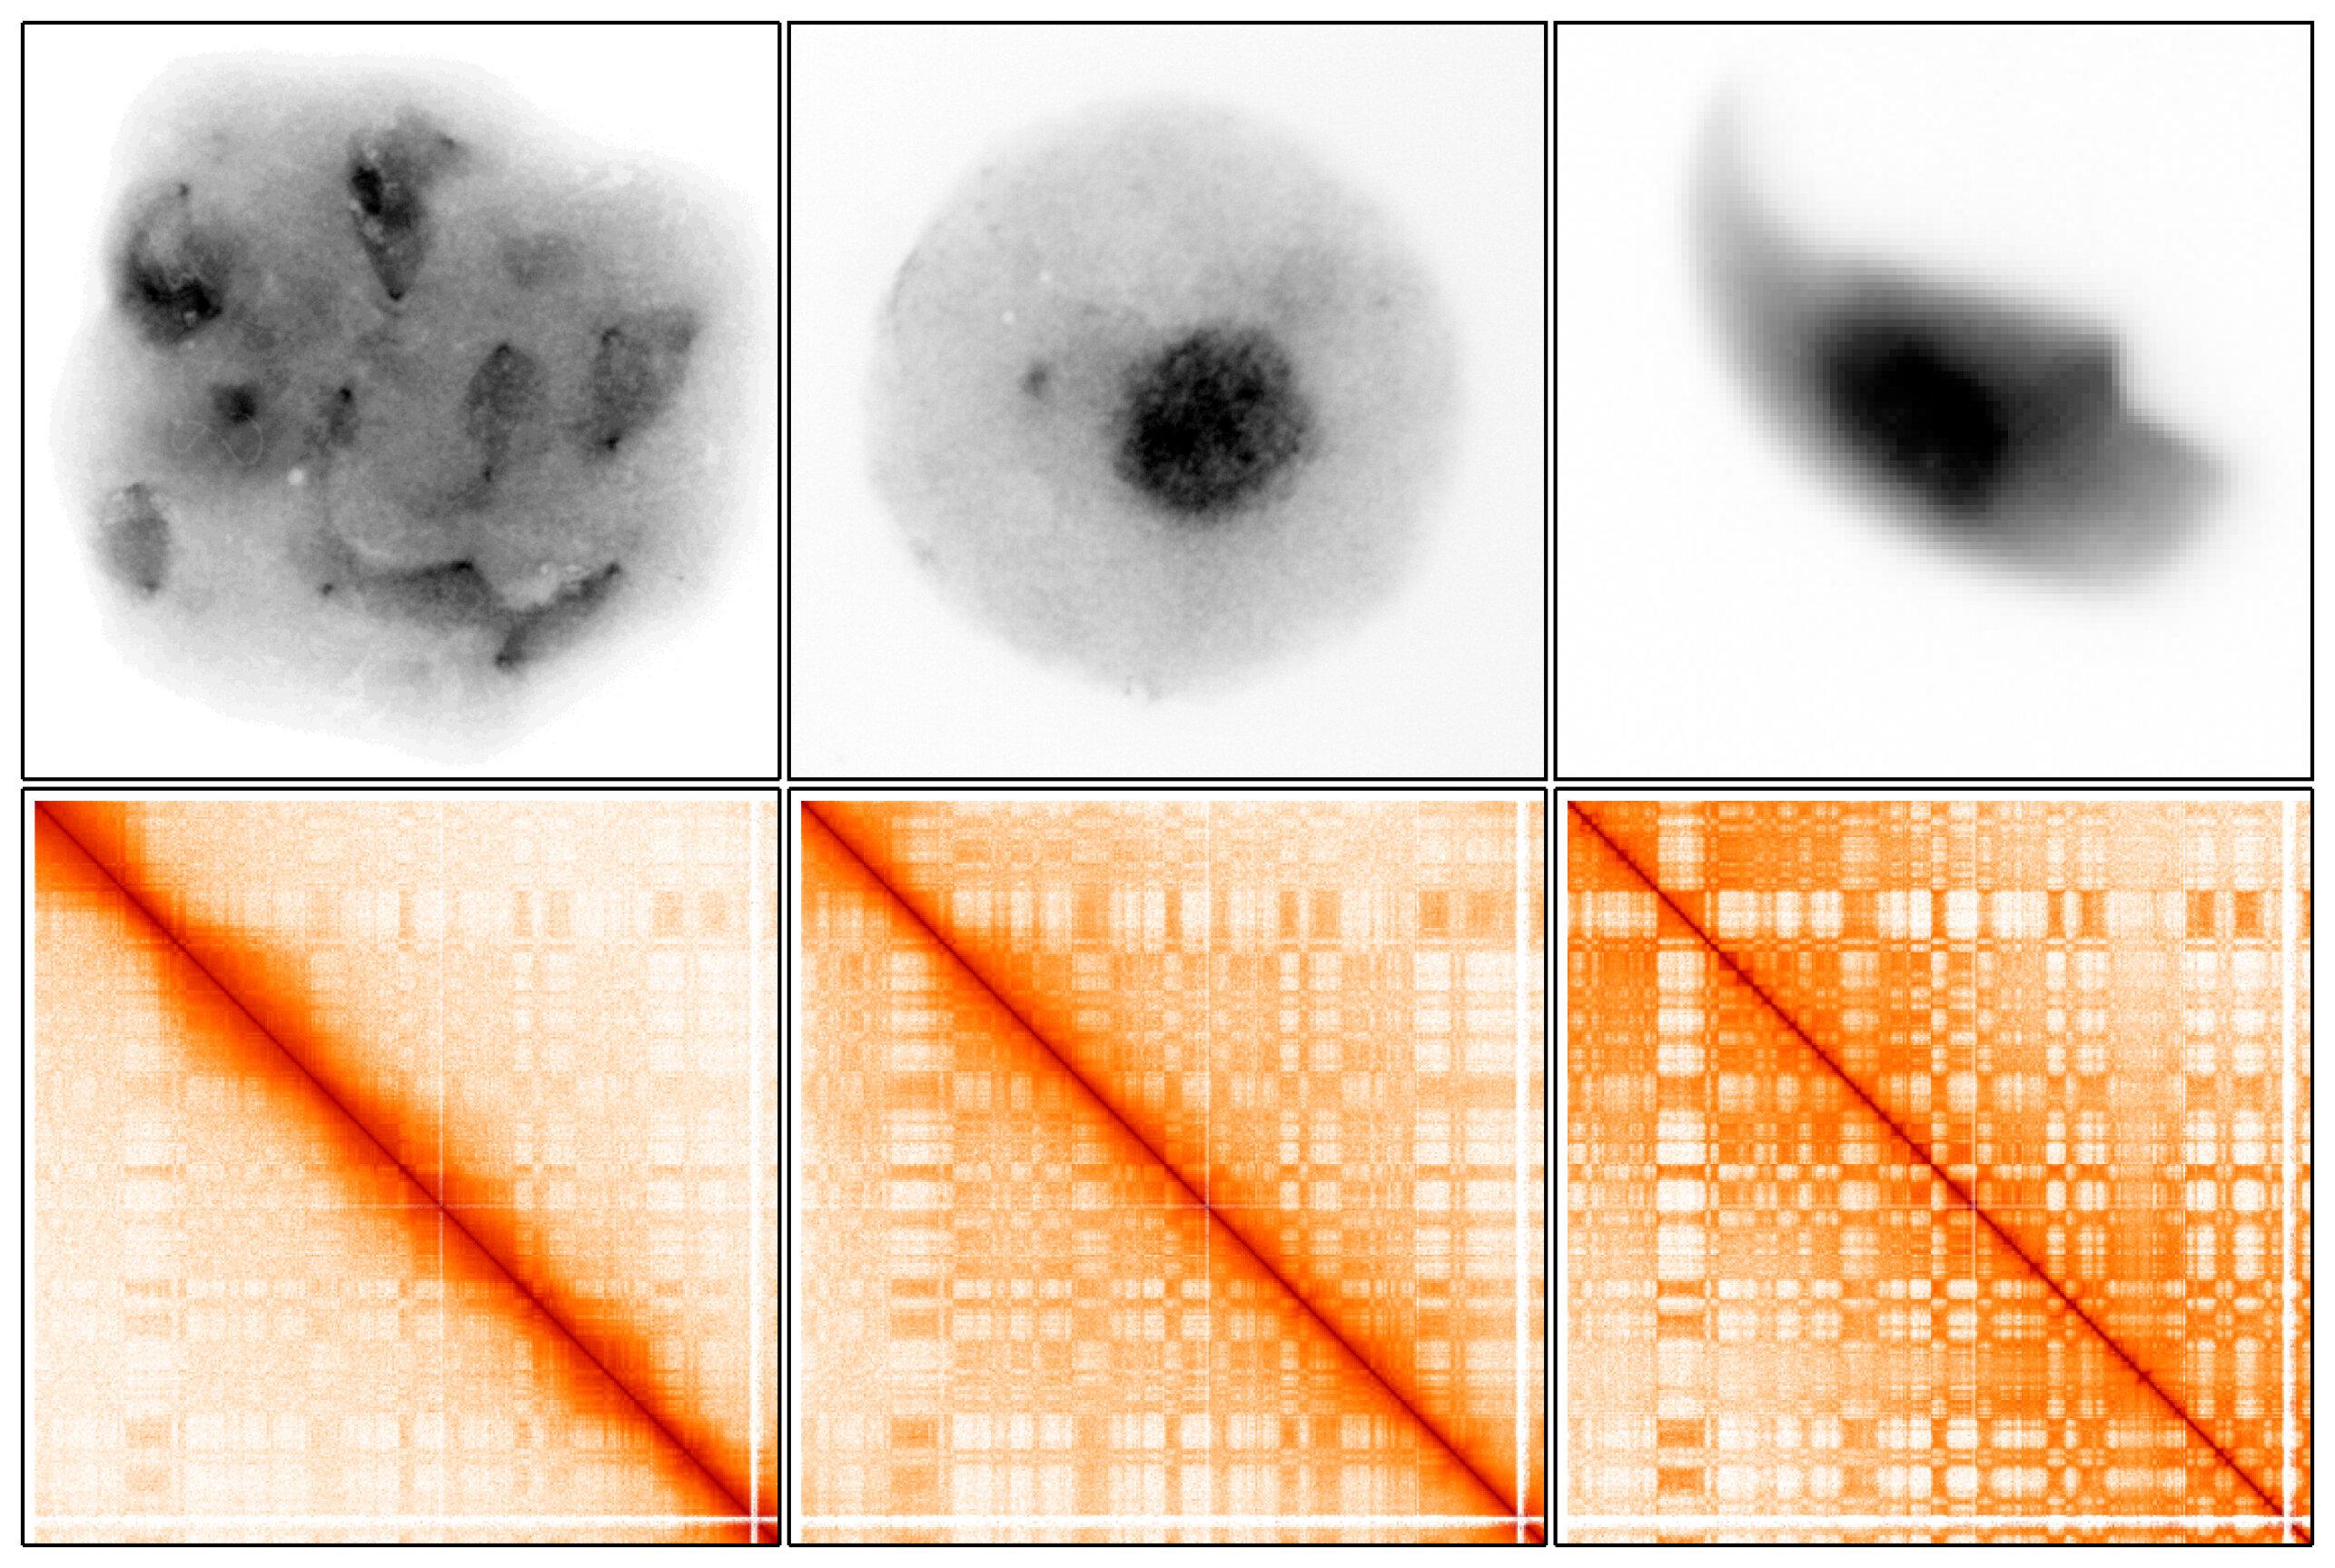 Scientists reveal how 3-D arrangement of DNA helps perpetuate the species